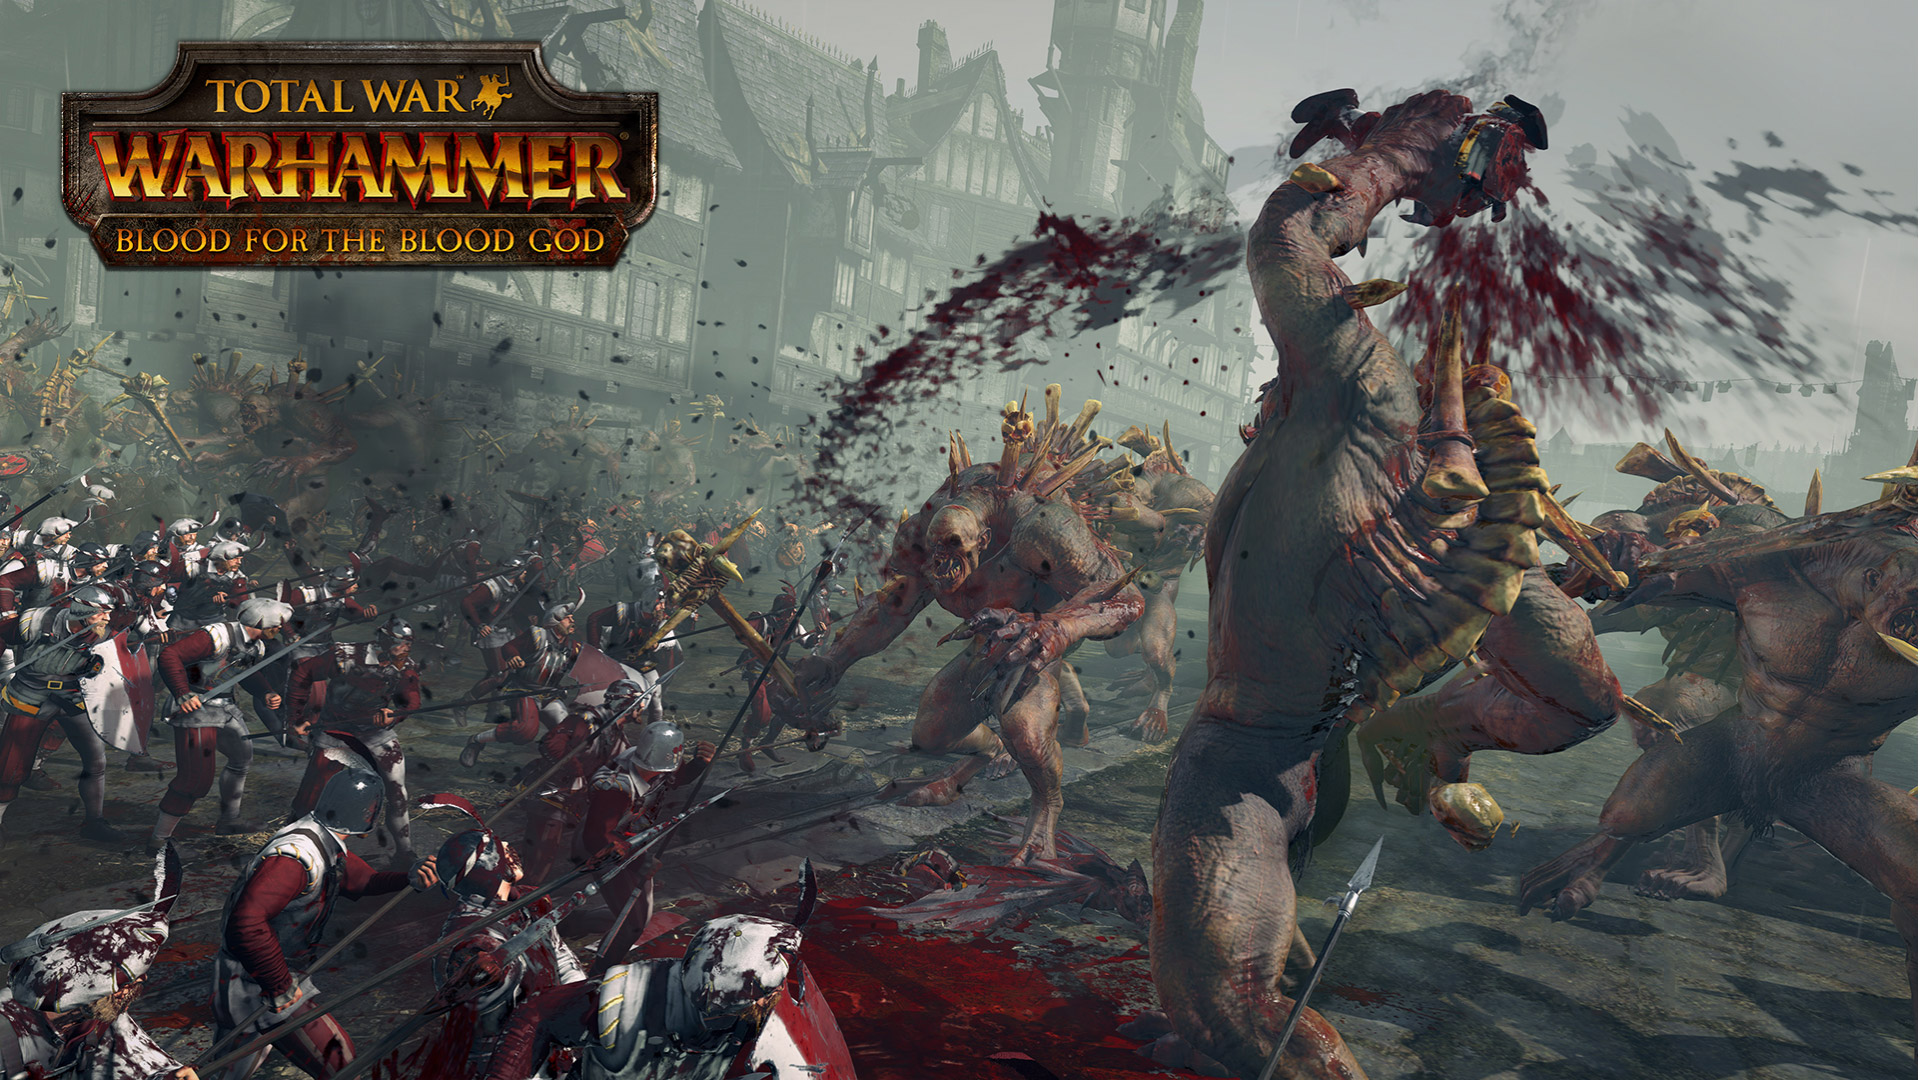 Free Total War: Warhammer Wallpaper in 1920x1080